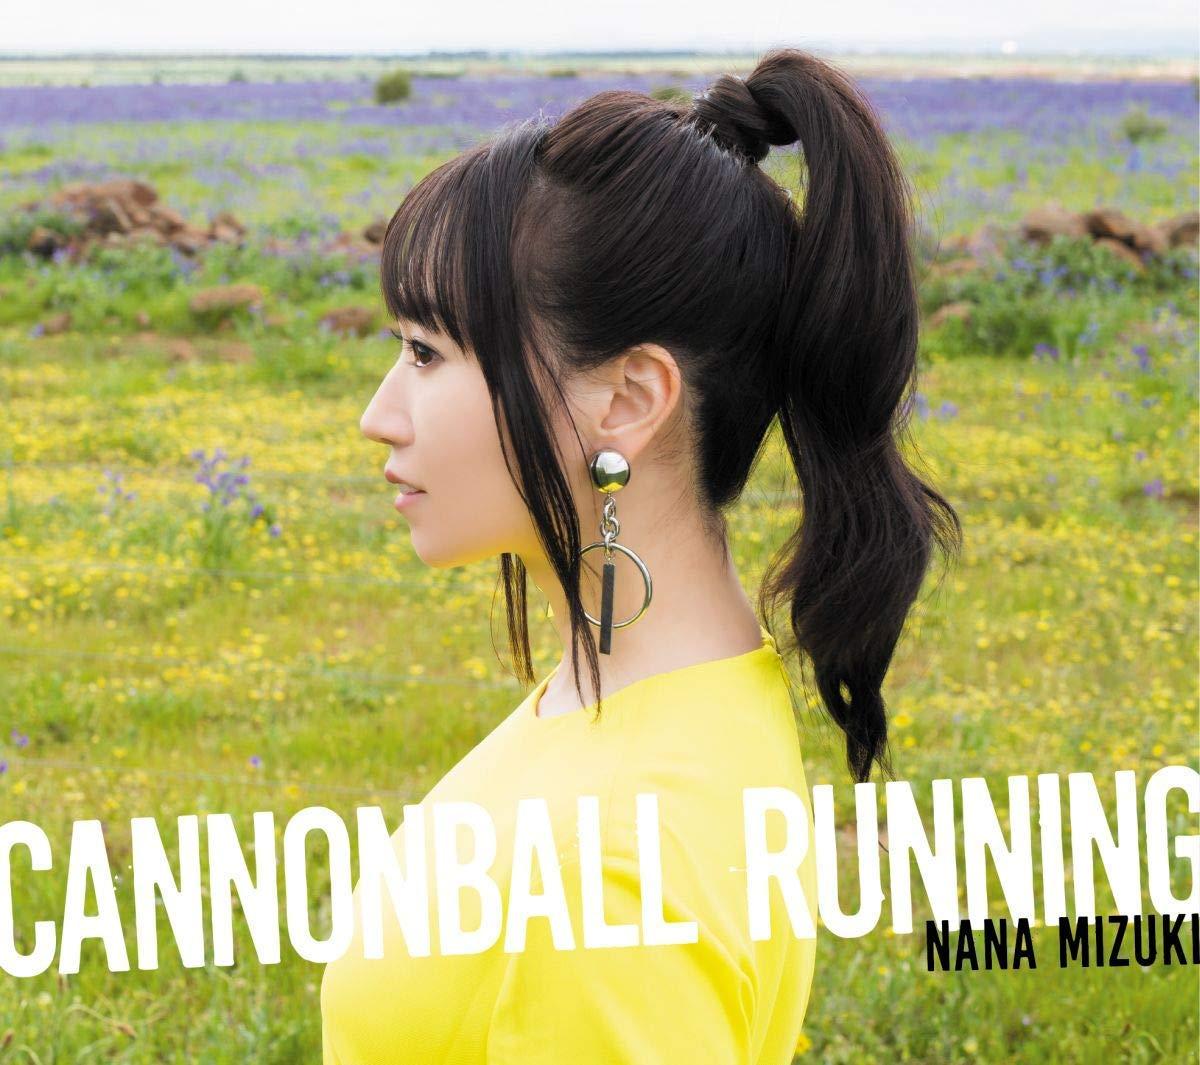 Nana Mizuki - CANNONBALL RUNNING (Album) / 水樹奈々